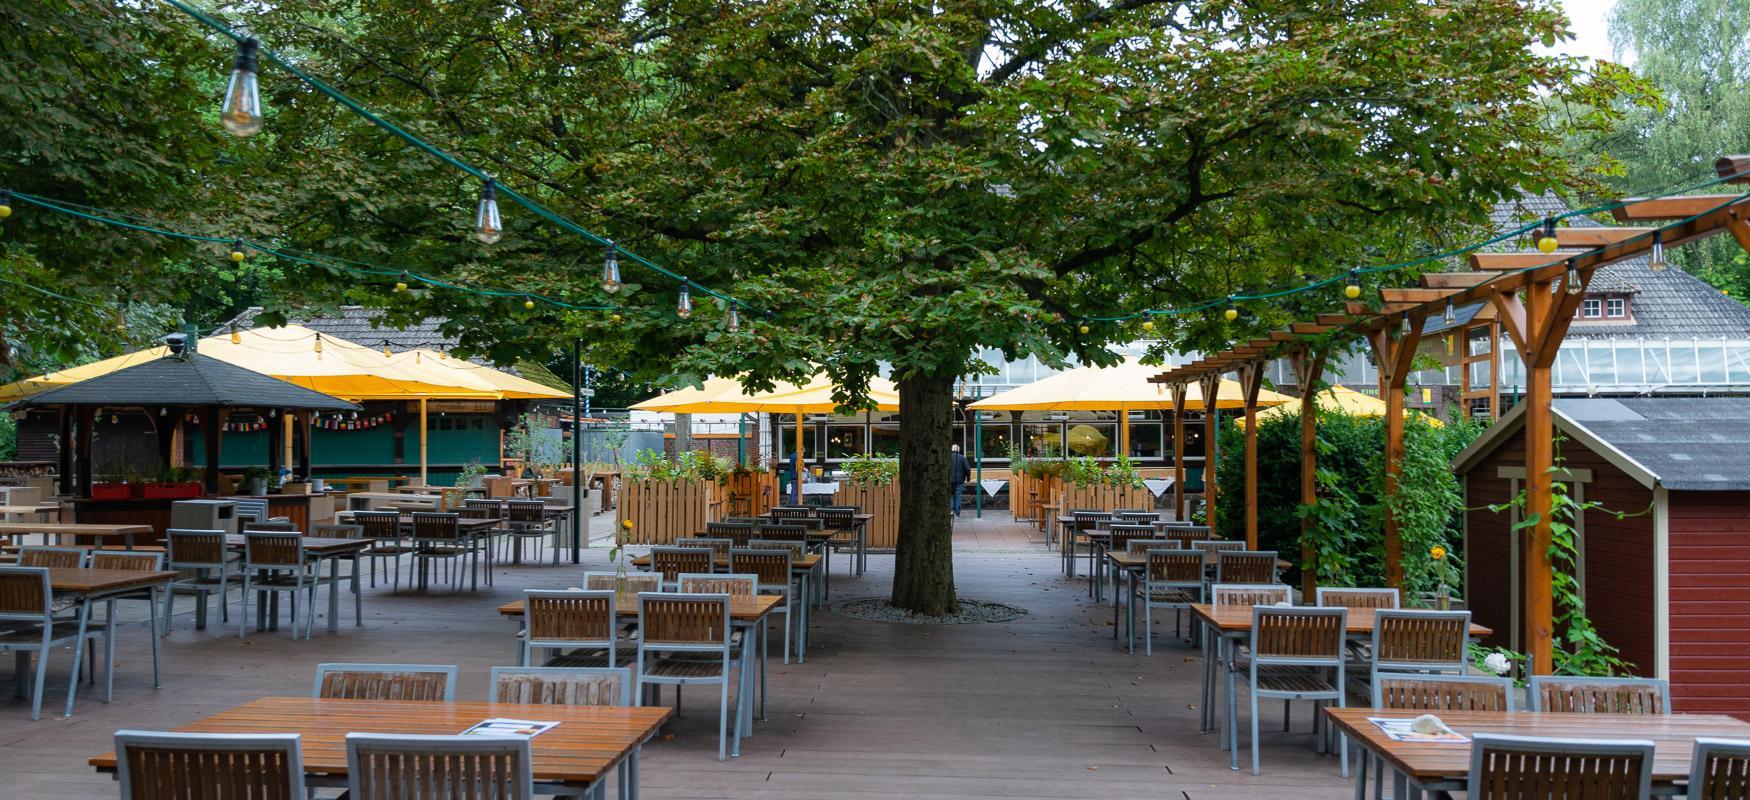 Forstbaumschule Restaurant VB 097 kl Forstbaumschule